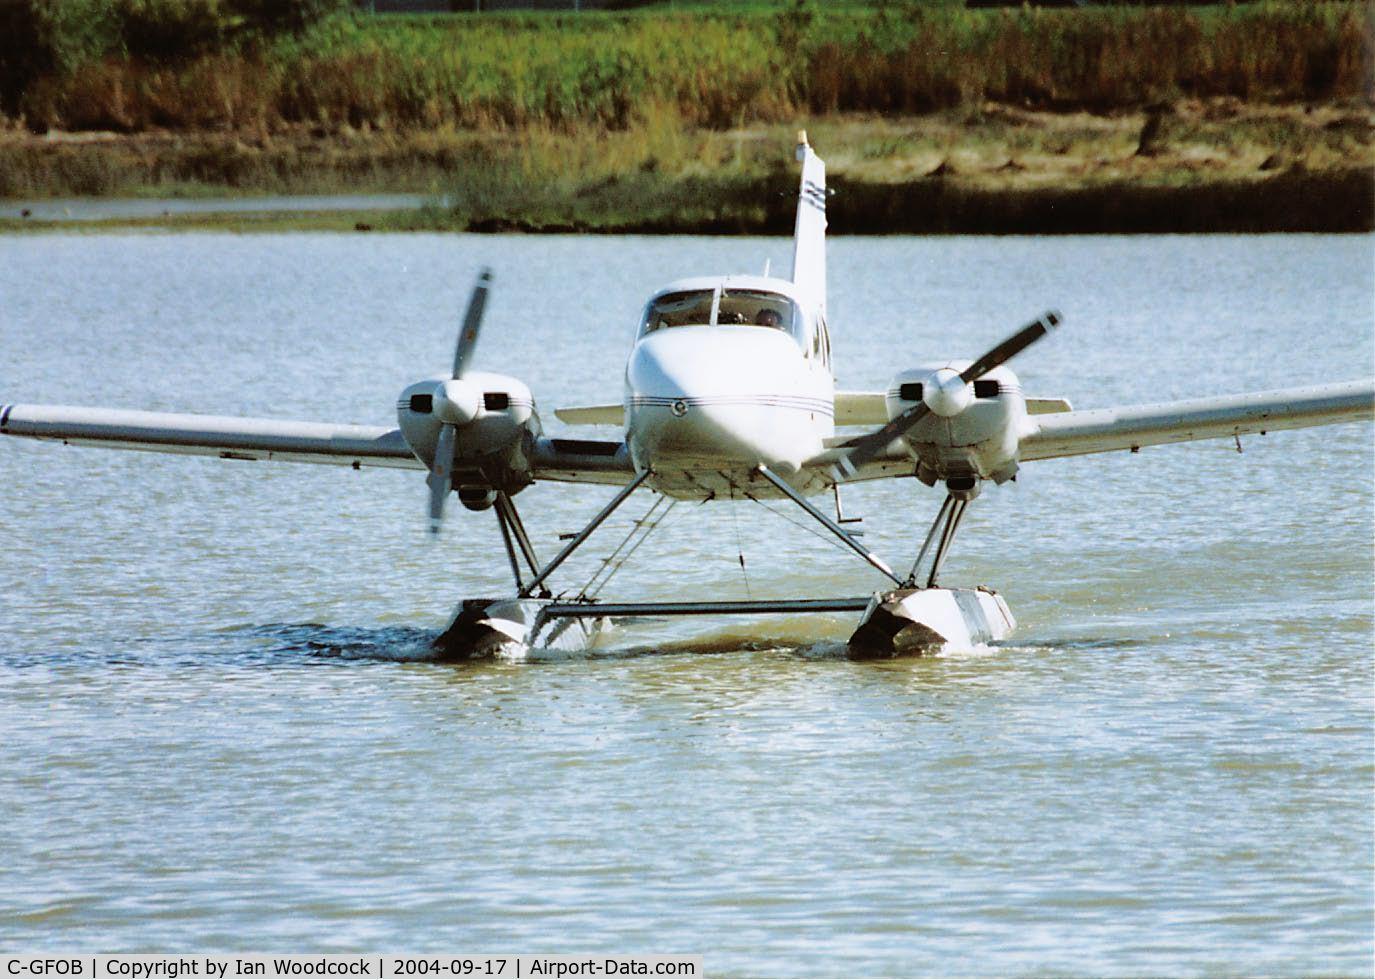 C-GFOB, 1969 Piper PA-23-250 Aztec C/N 27-4000, PA-23 250/Vancouver